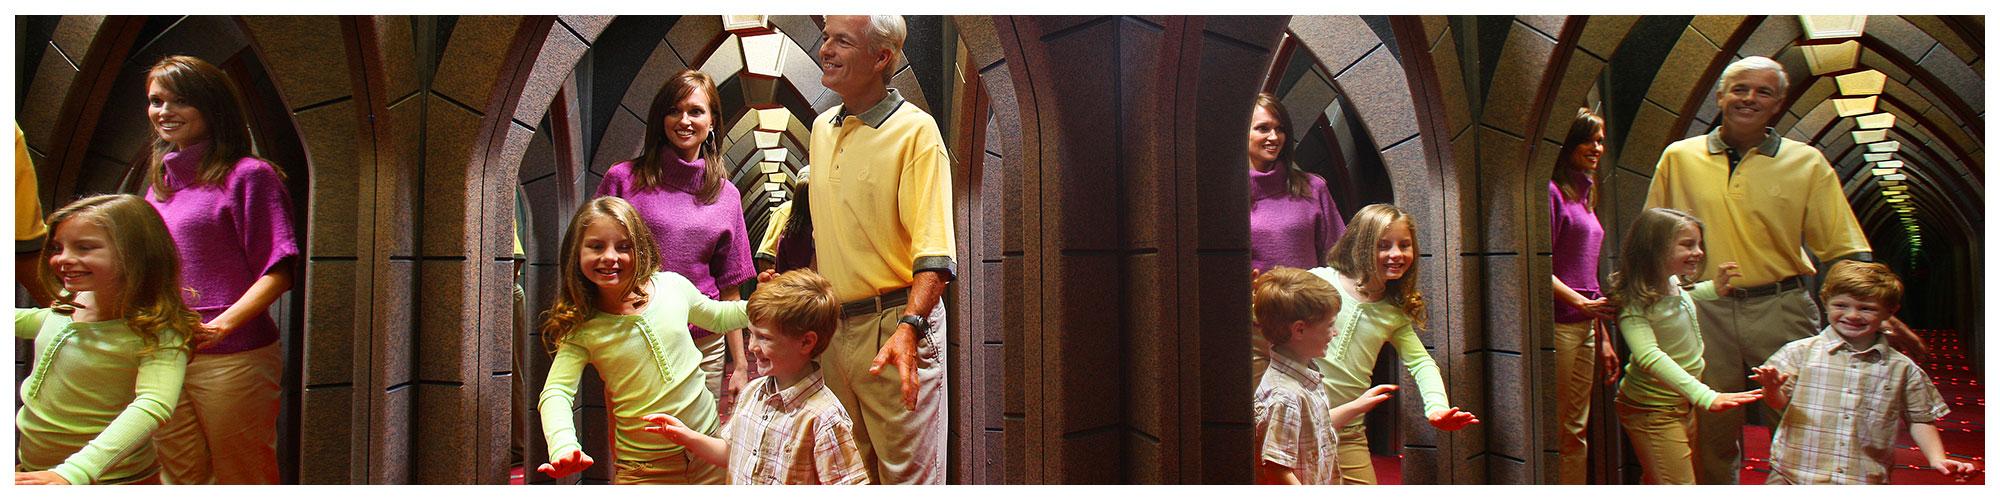 Ripley's Marvelous Mirror Maze (Header Background) | Gatlinburg Attractions